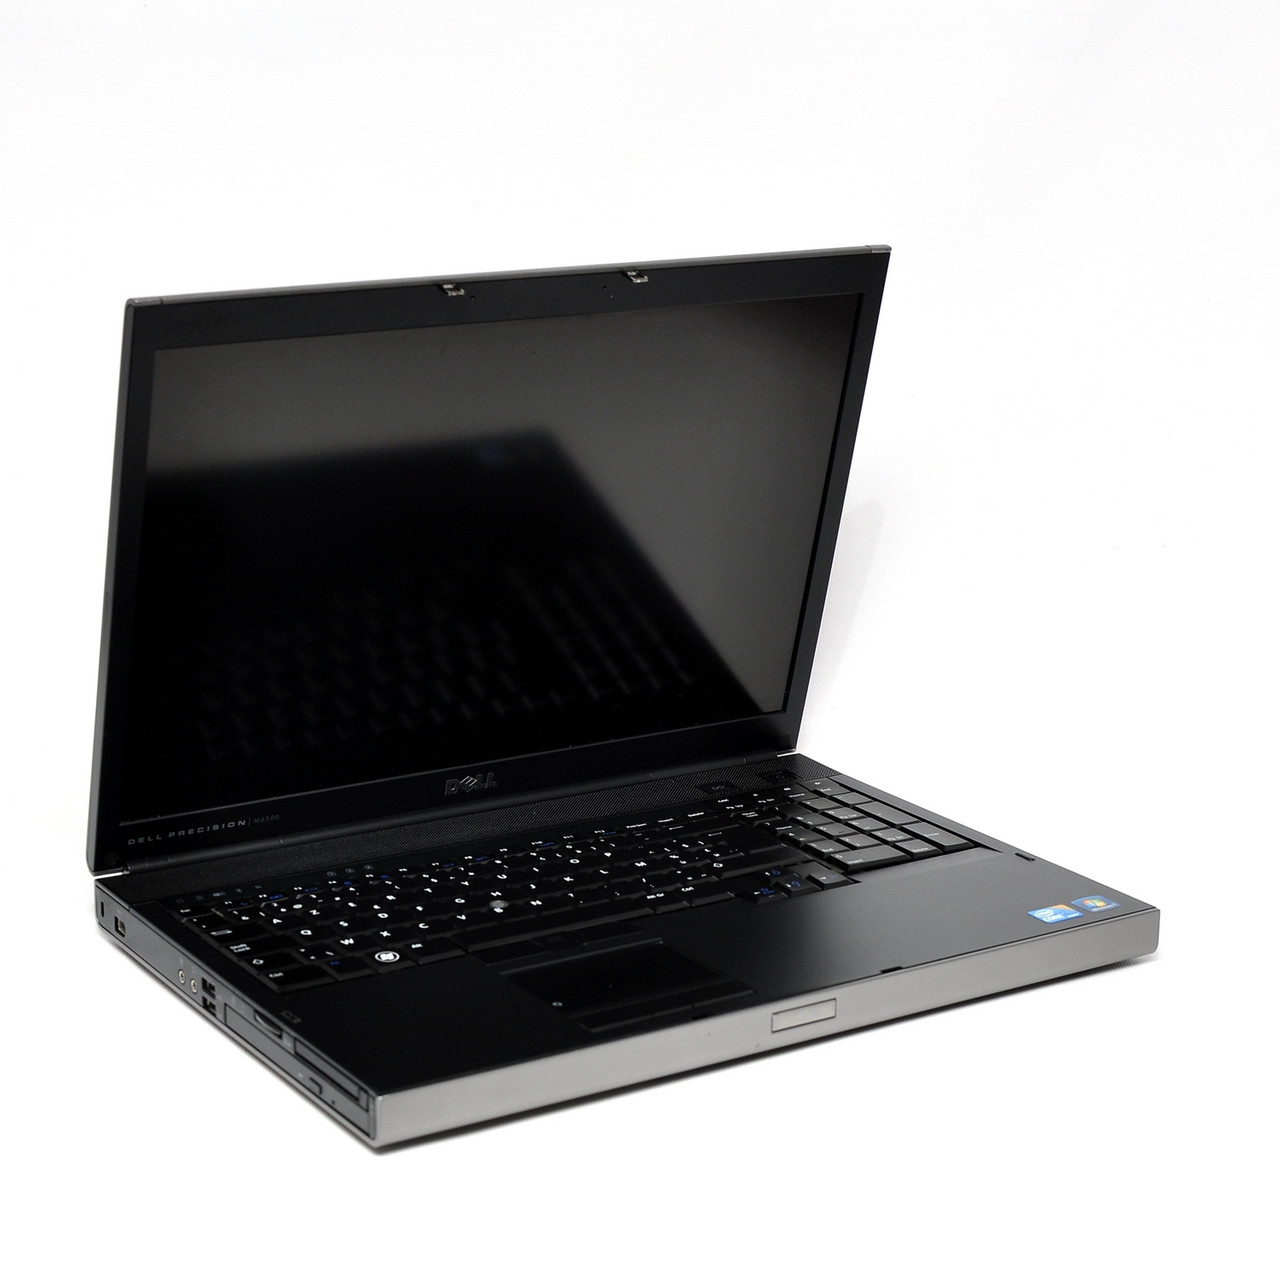 Б/У Ноутбук HP Zbook 15 / 15.6 FHD IPS / i7-4700MQ / 8 RAM/ 120 SSD/ Intel HD4600/GeForce K2100m